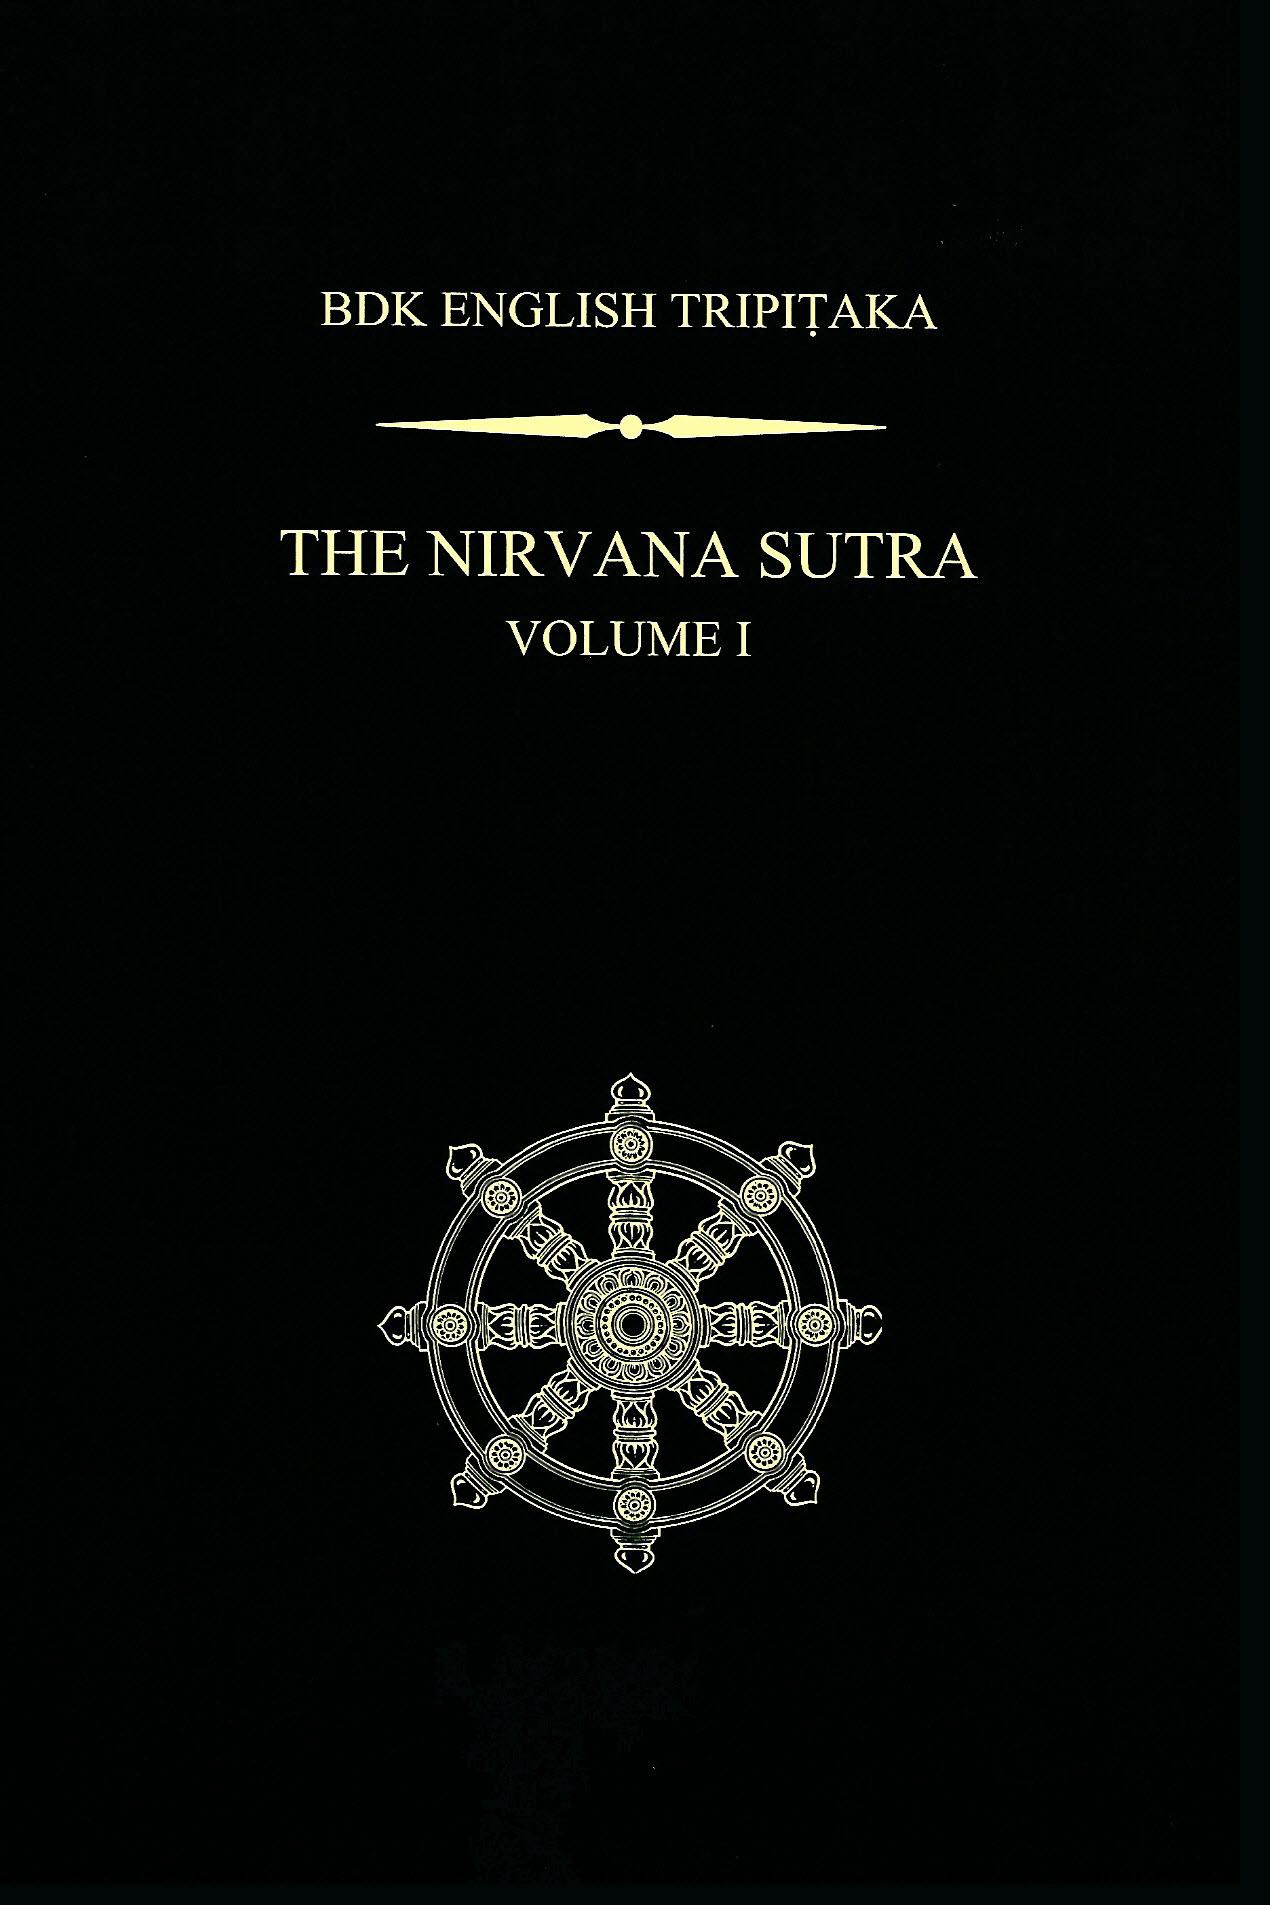 Blum Nirvana Sutra cover art